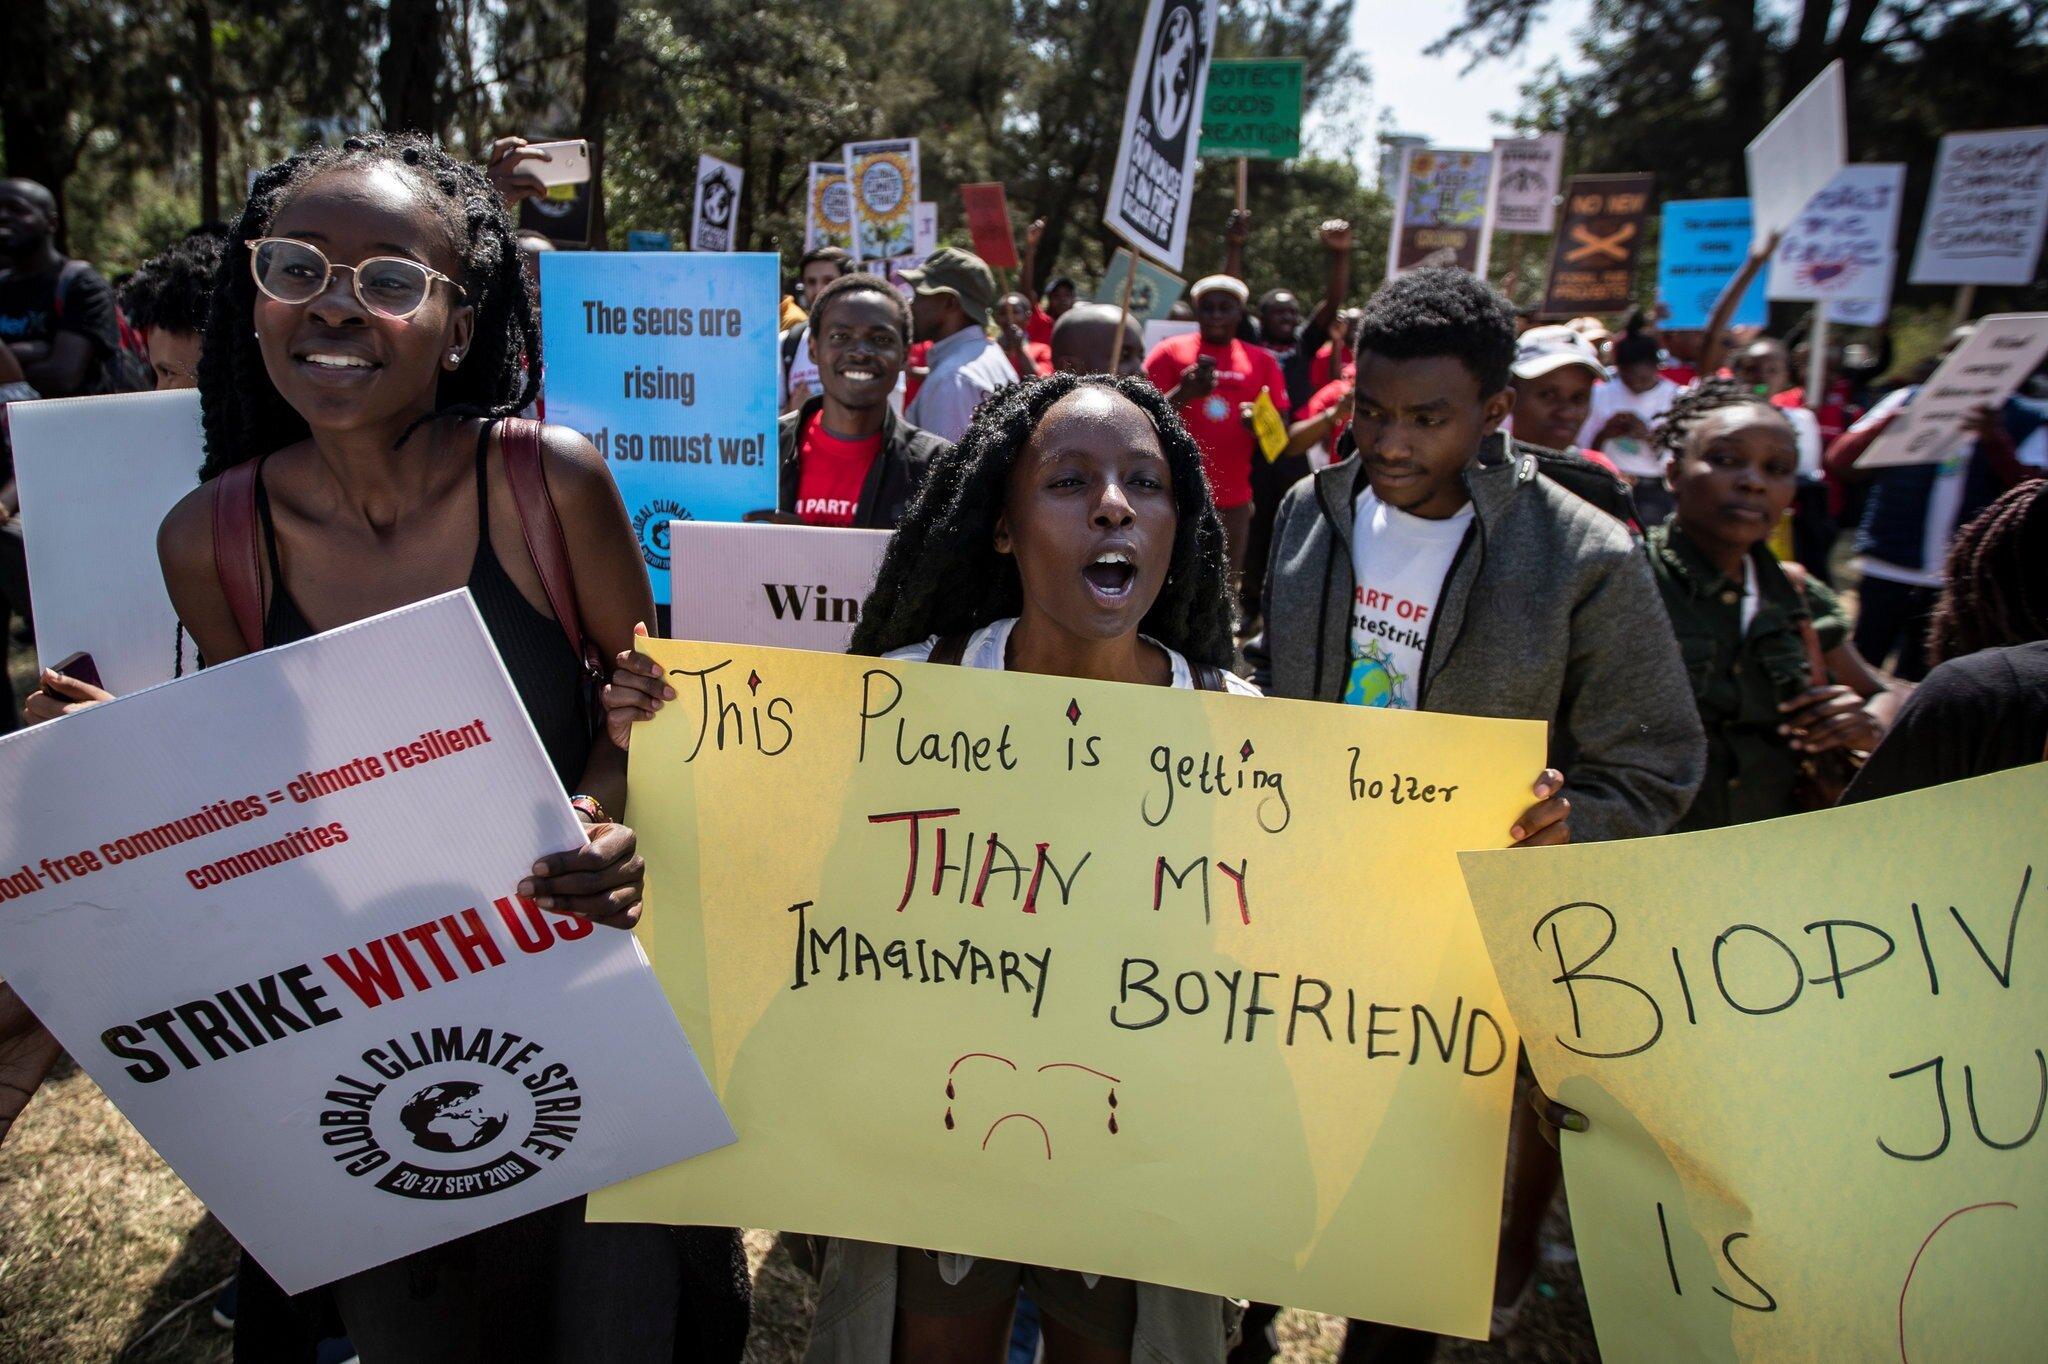 Kenyans marched through the Nairobi city center. Credit Ben Curtis/Associated Press